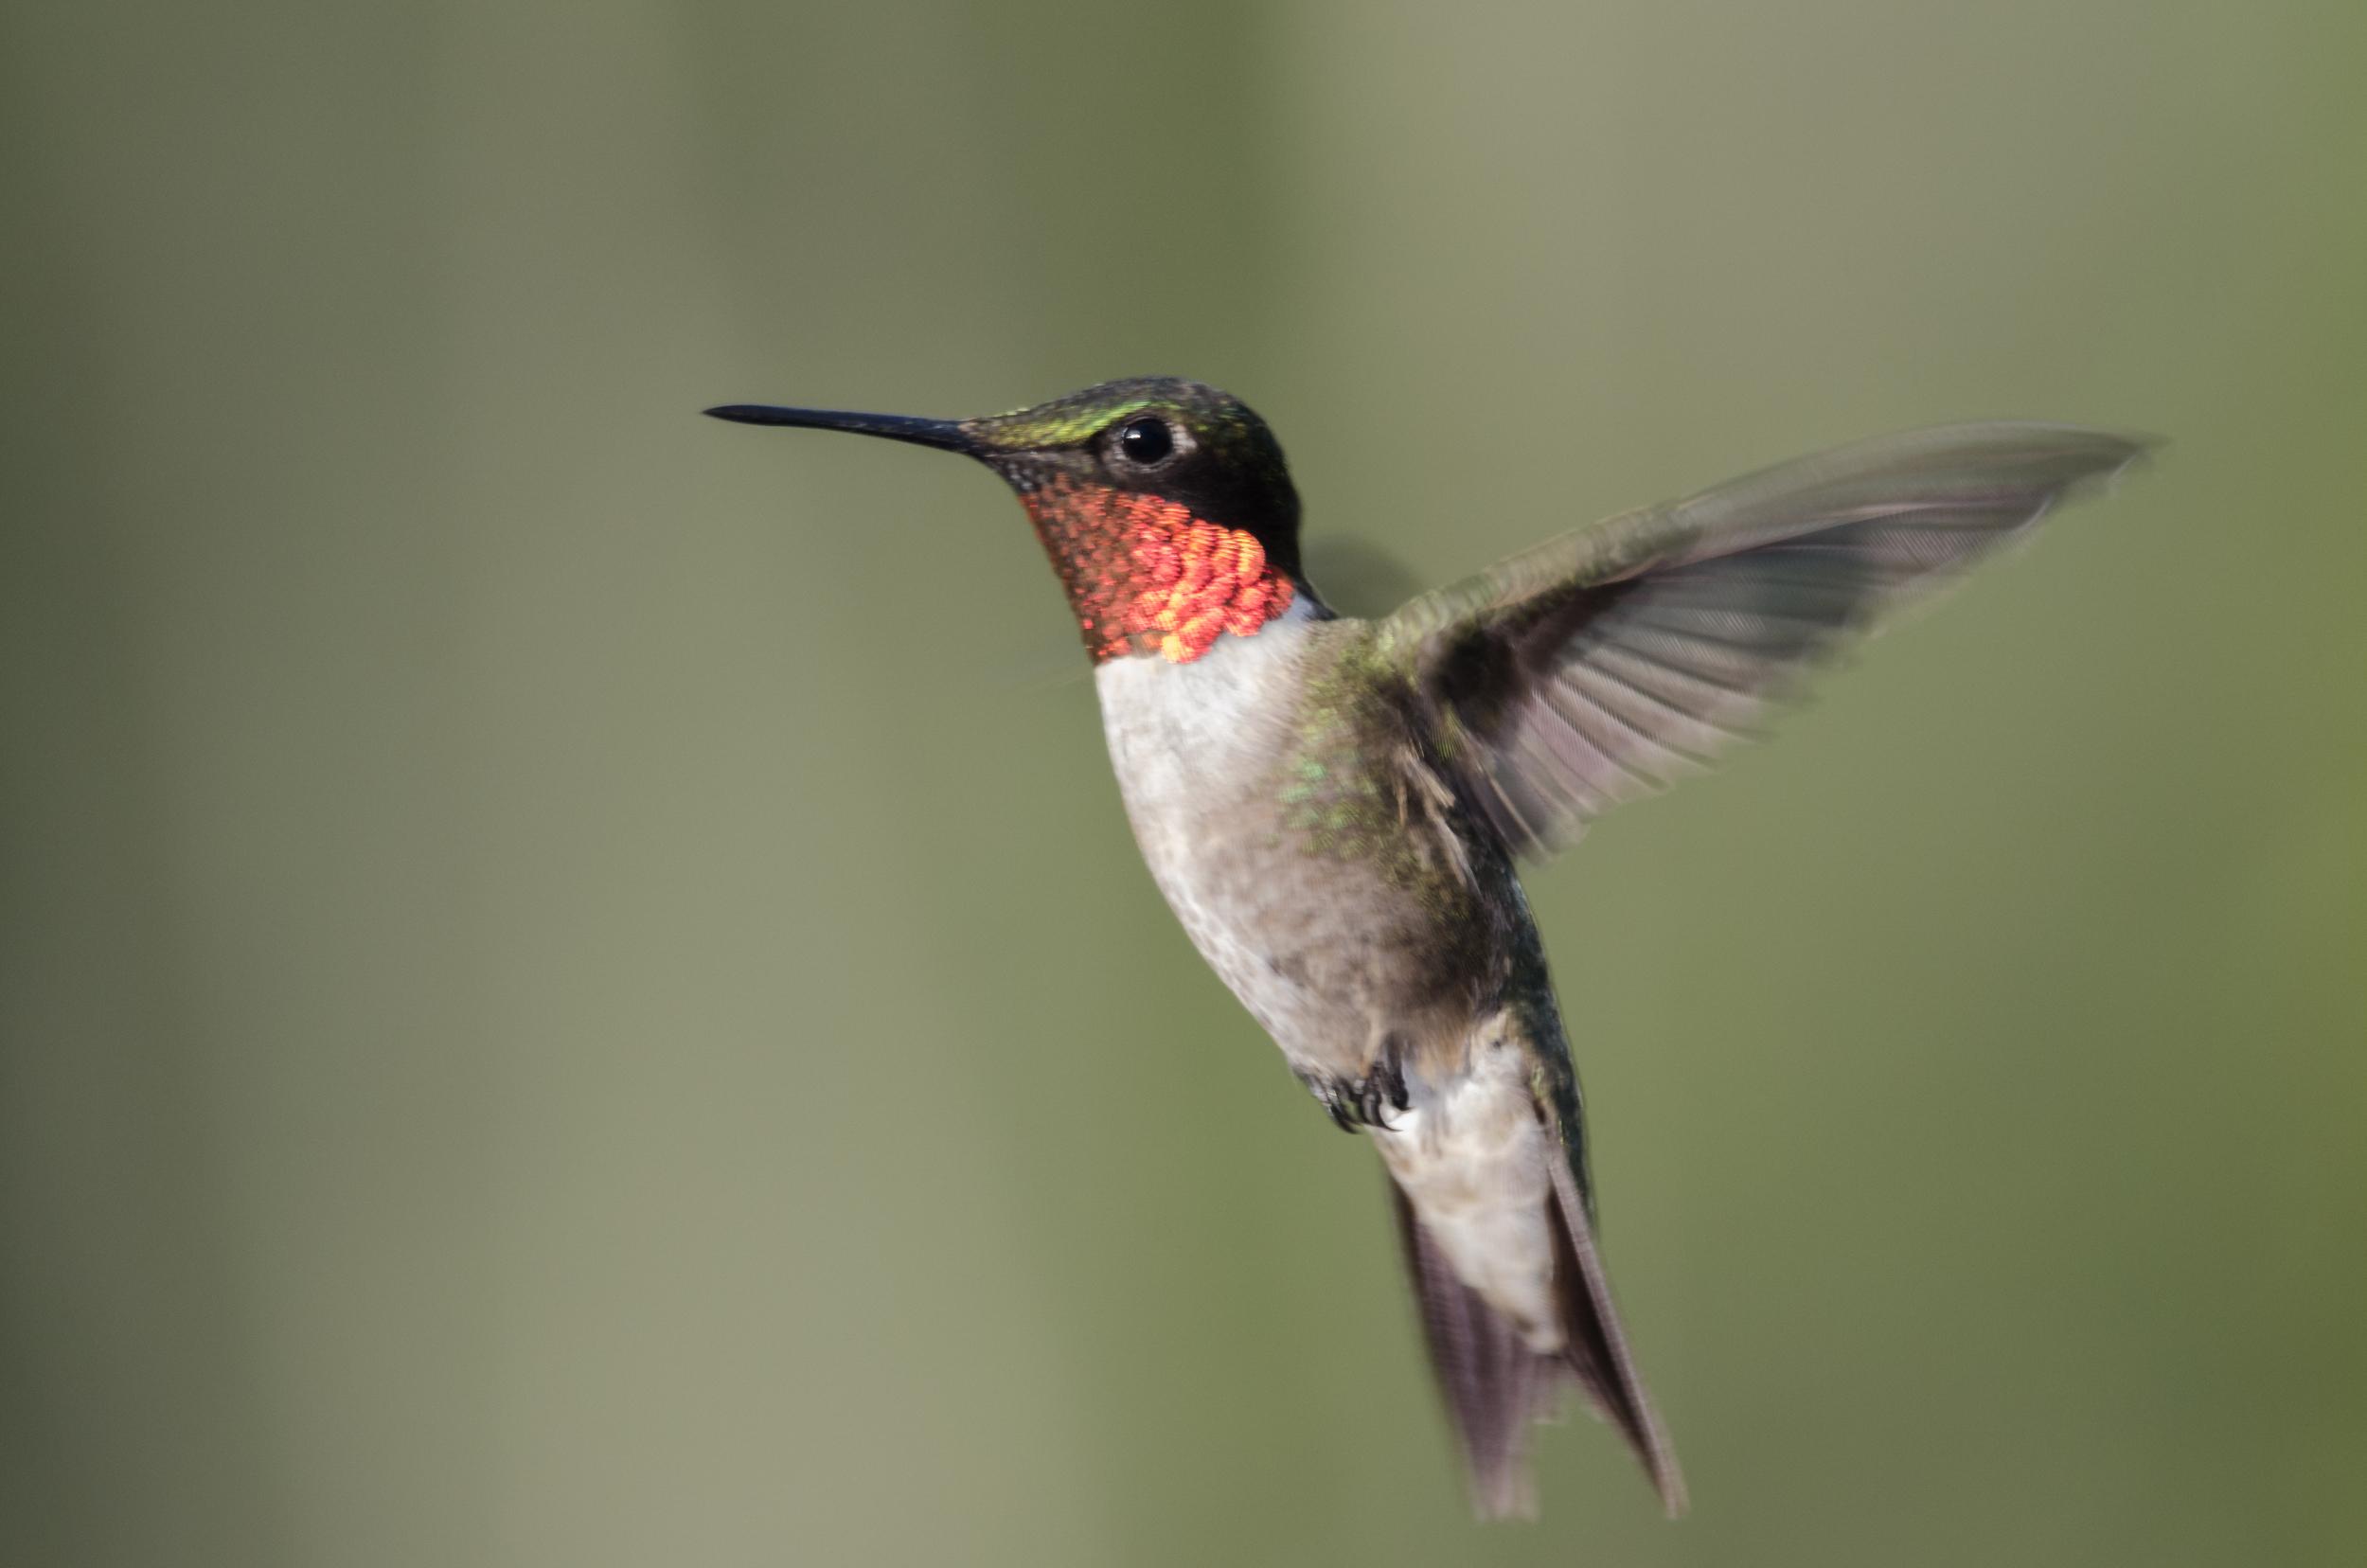 Male Hummingbird Nikon D7000 ISO 640 460mm f/6.3 1/250 sec. with a single off-camera flash